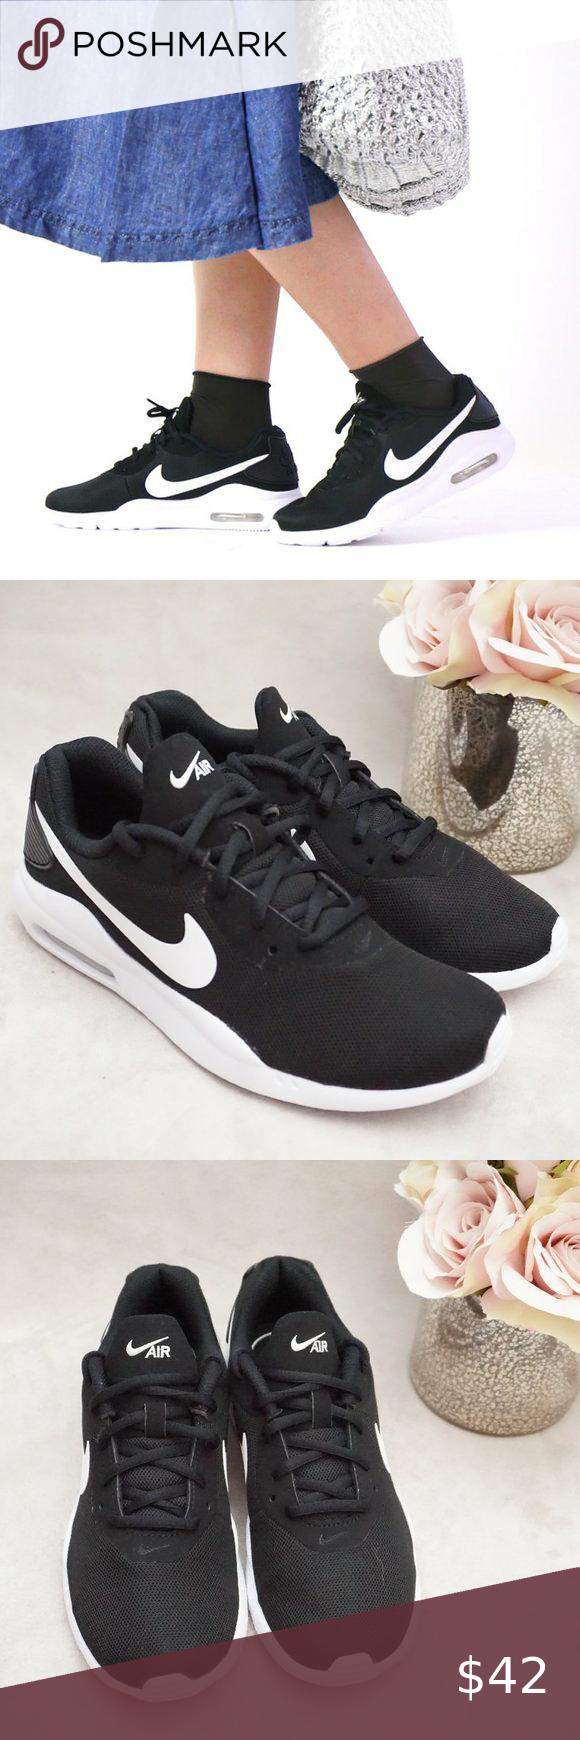 Nike Air Max Oketo Running Shoes Causal